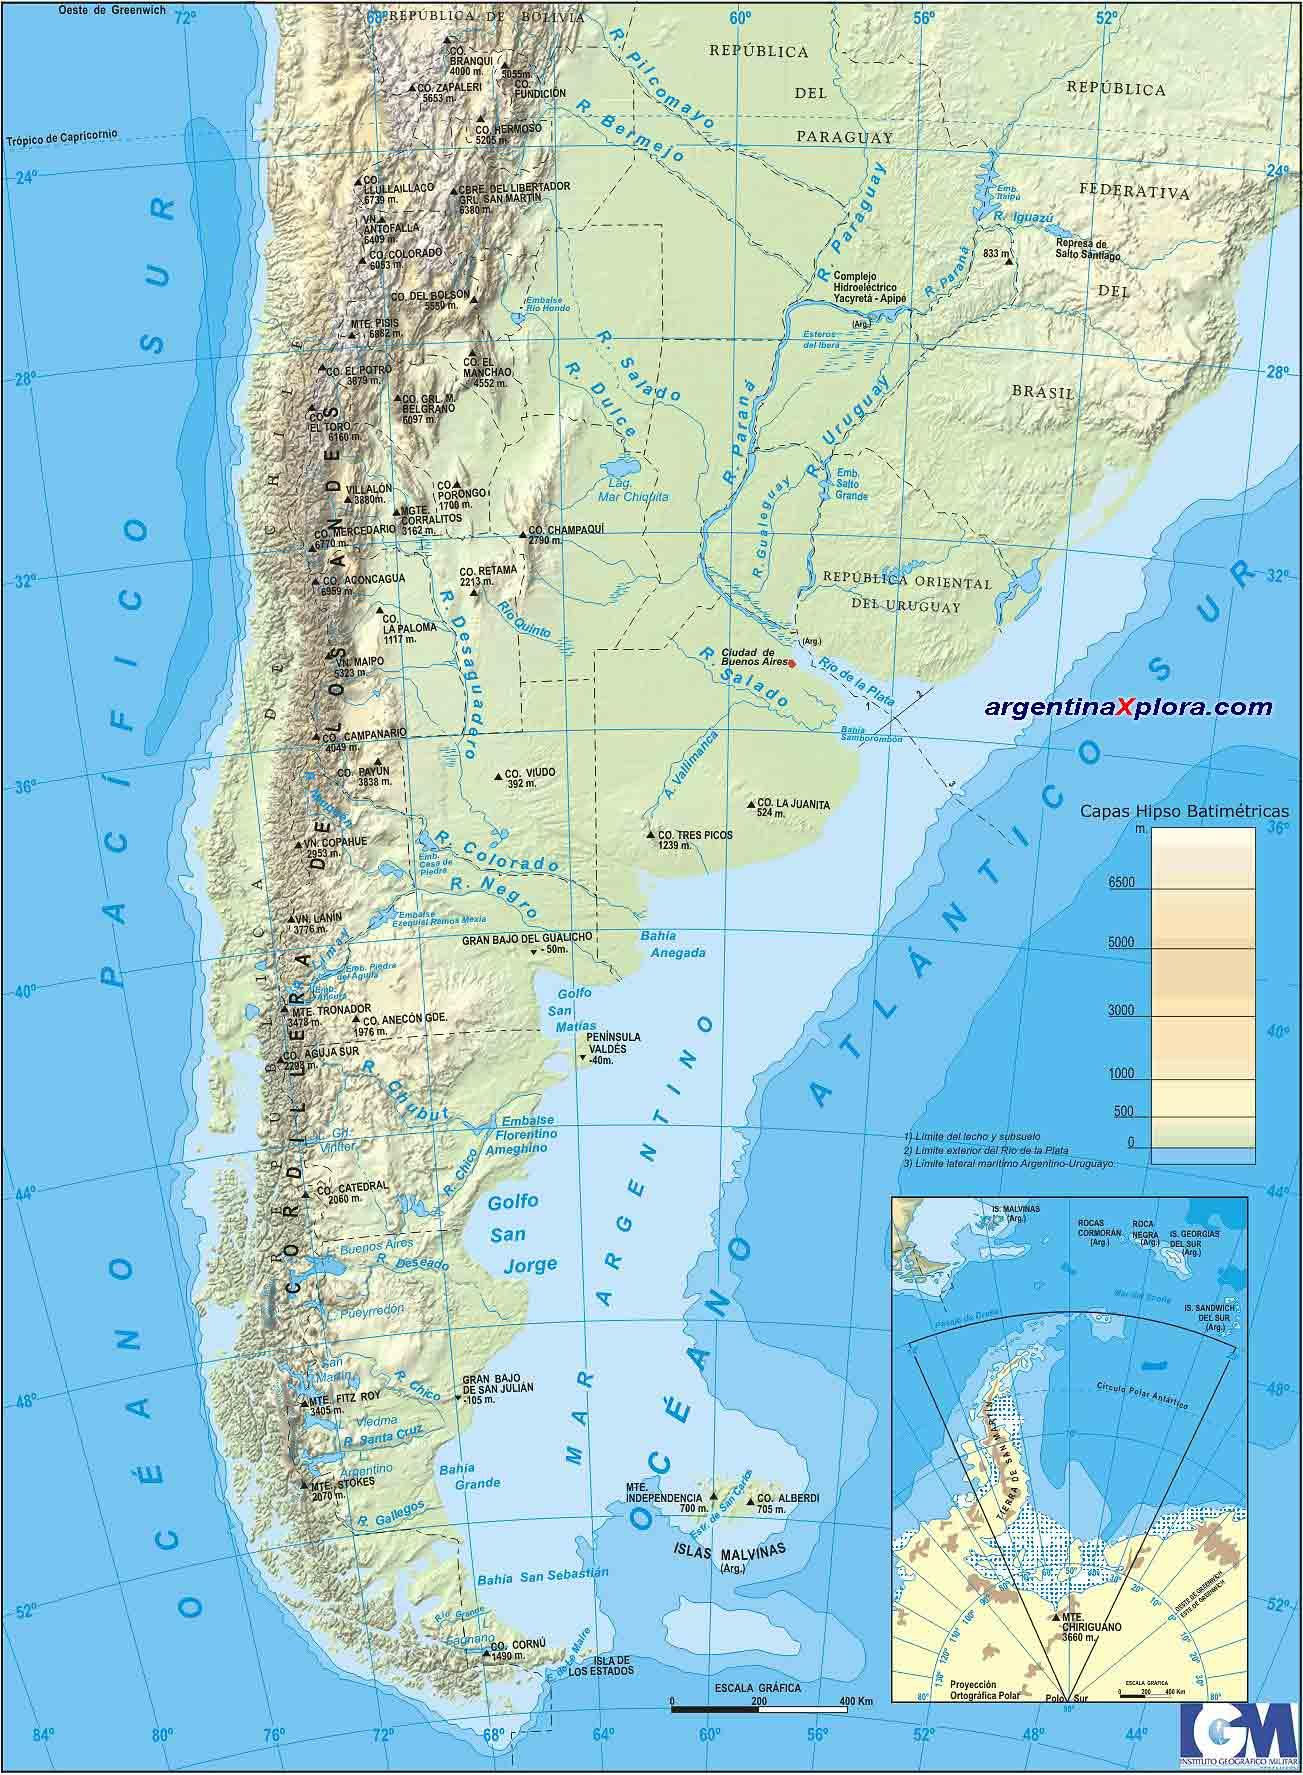 Mapa Fisico De Argentina Aspecto Físico - Argentina mapa